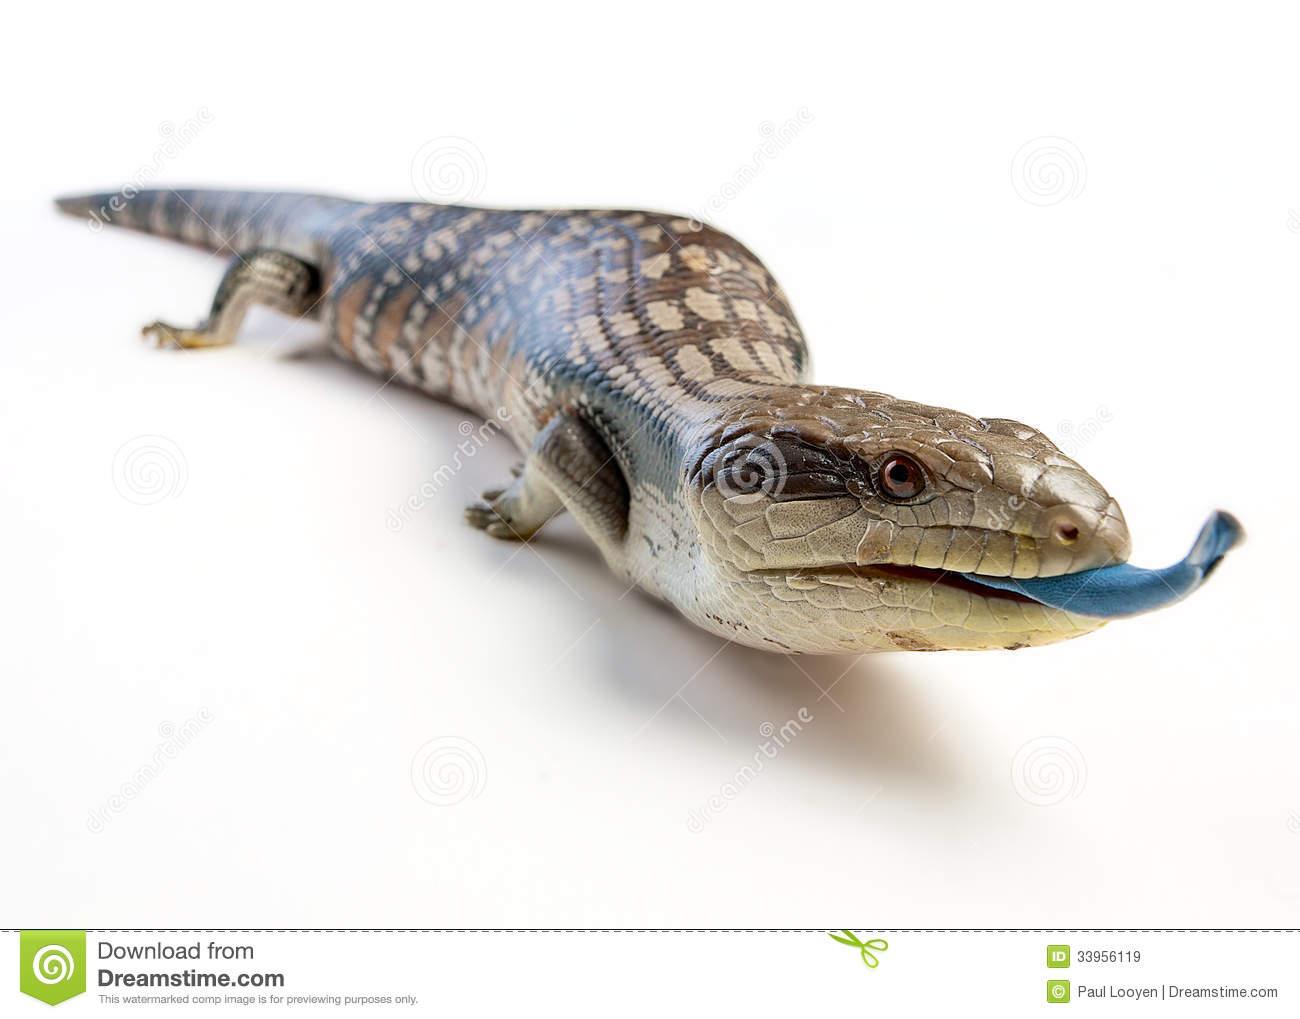 Blue tongue lizard clipart.